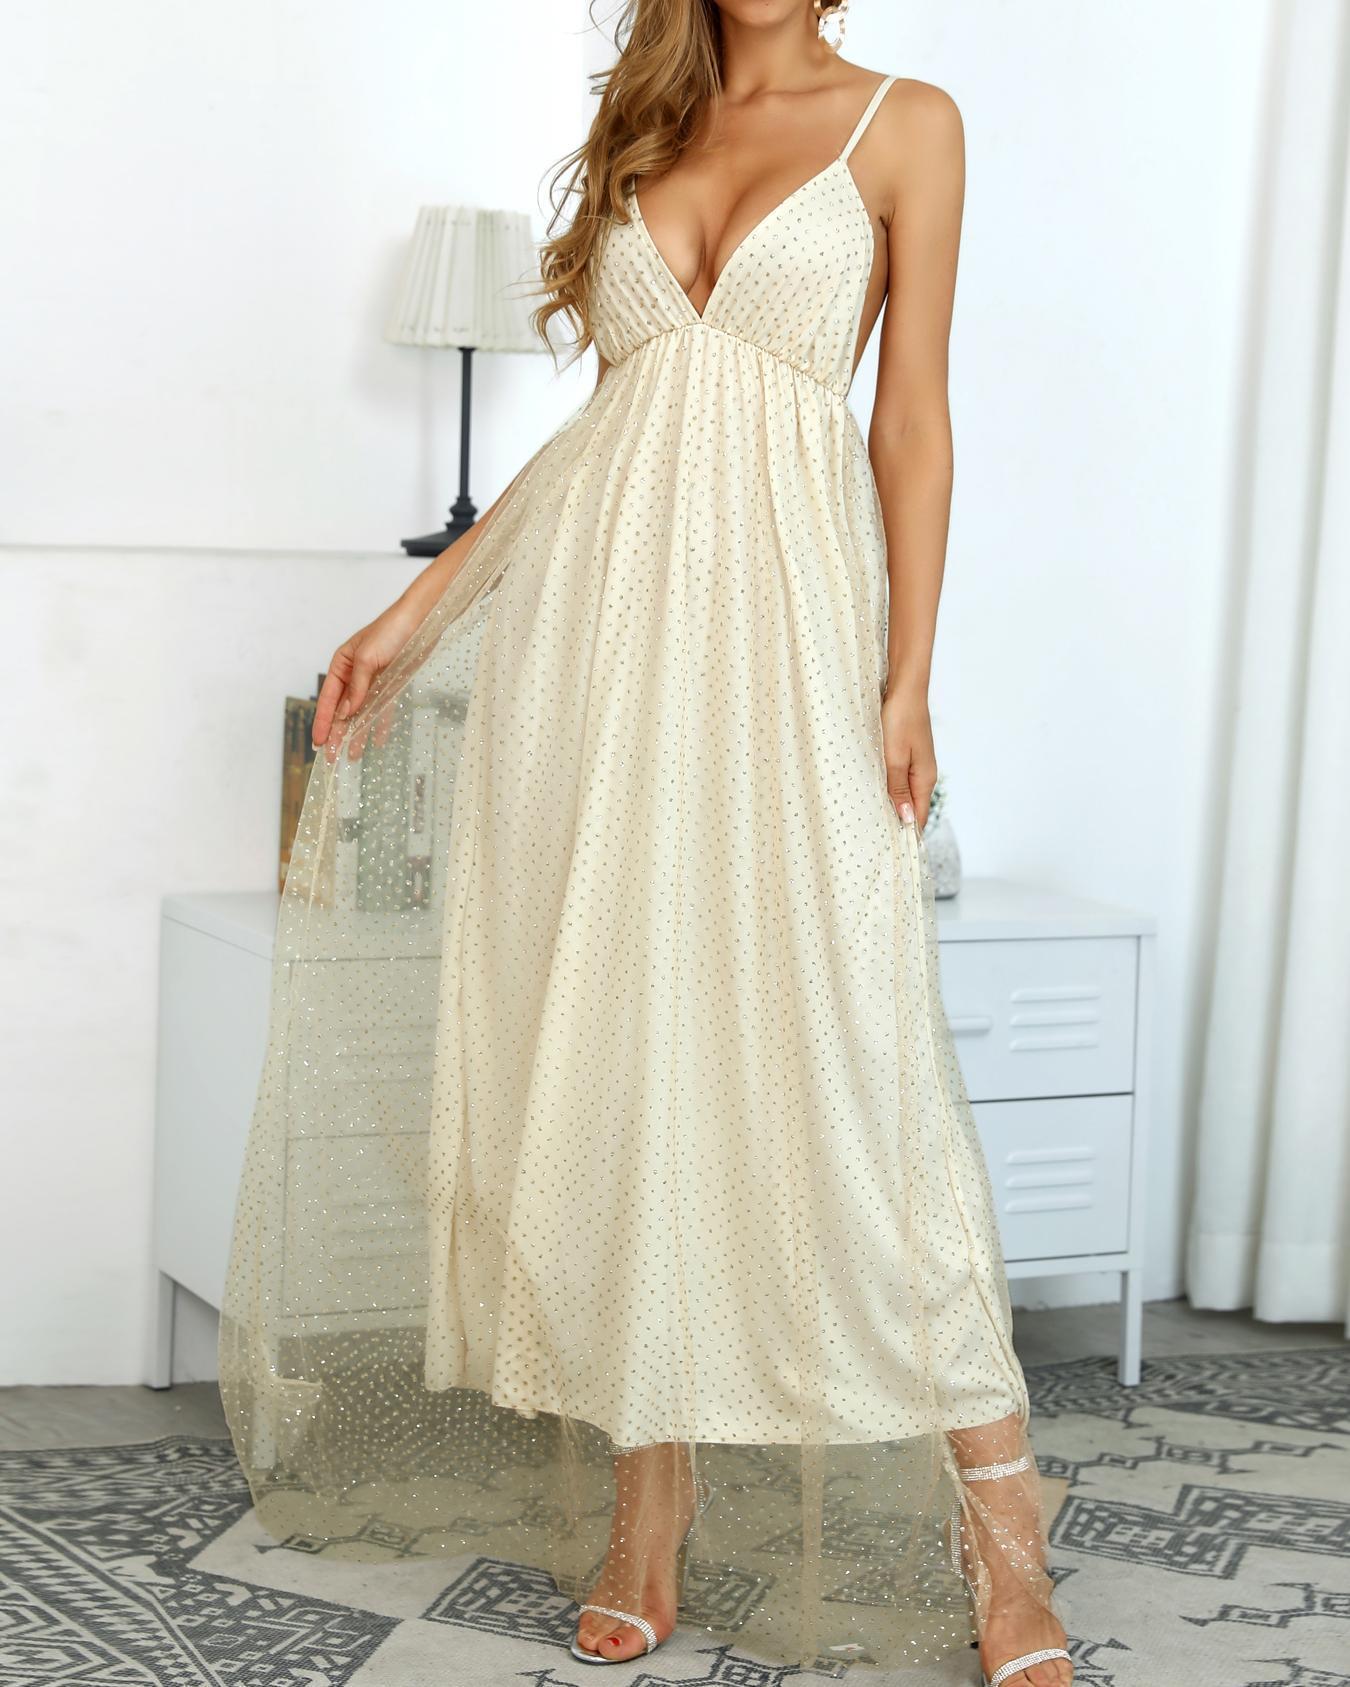 Glitter Spaghetti Strap Mesh Overlay Gowns Dress